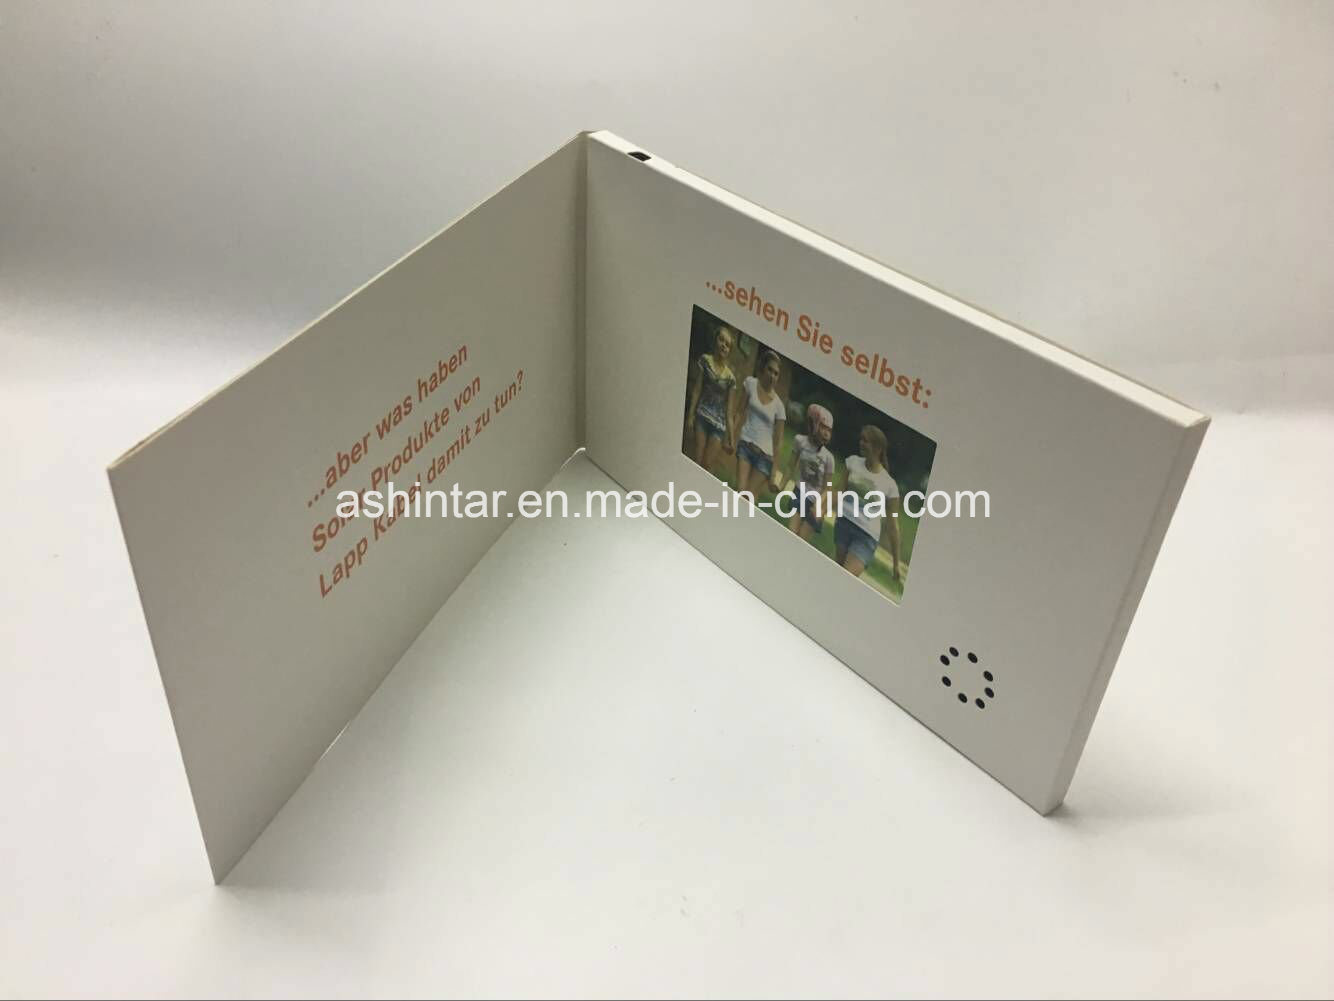 China Video Brochure Usb Webkey Flash Disk Lcd Video Greeting Cards